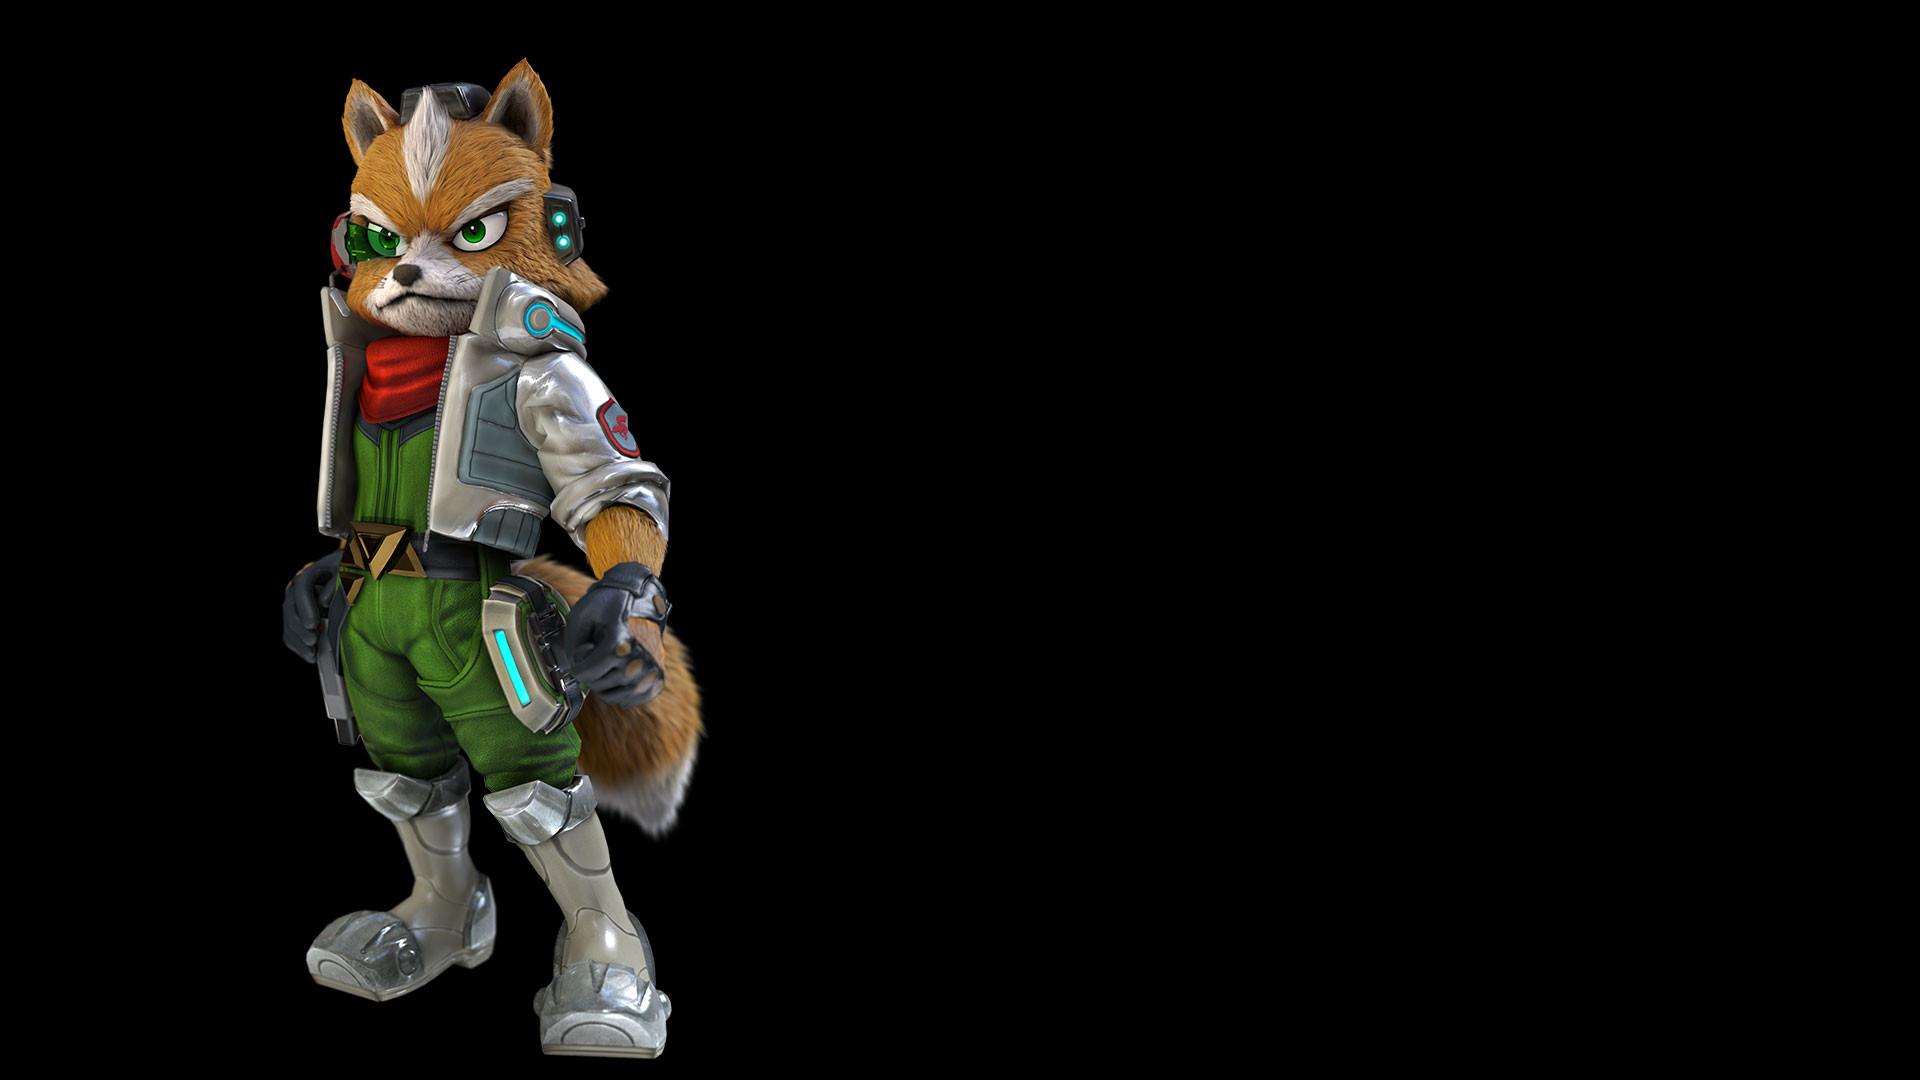 Fox's new design, taken from Nintendo's website. Thoughts?